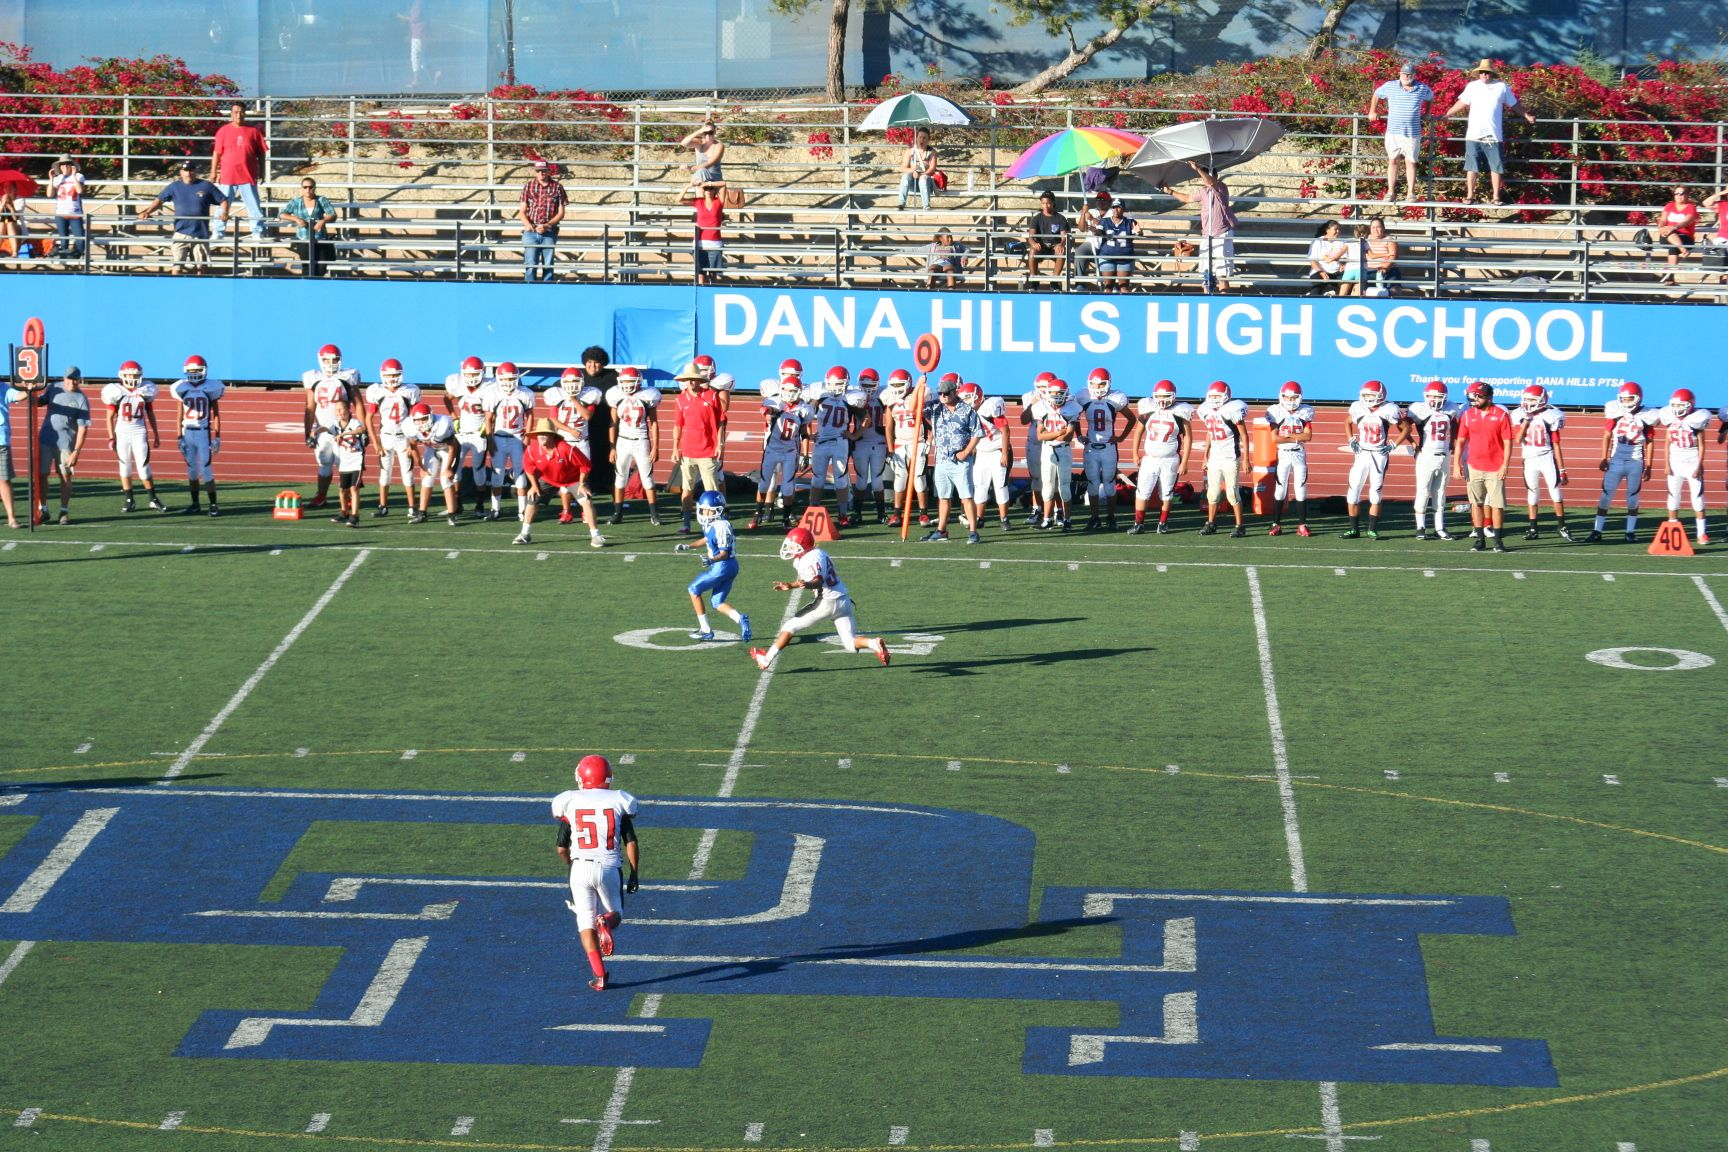 Dana Hills High School Football High School Football High School School